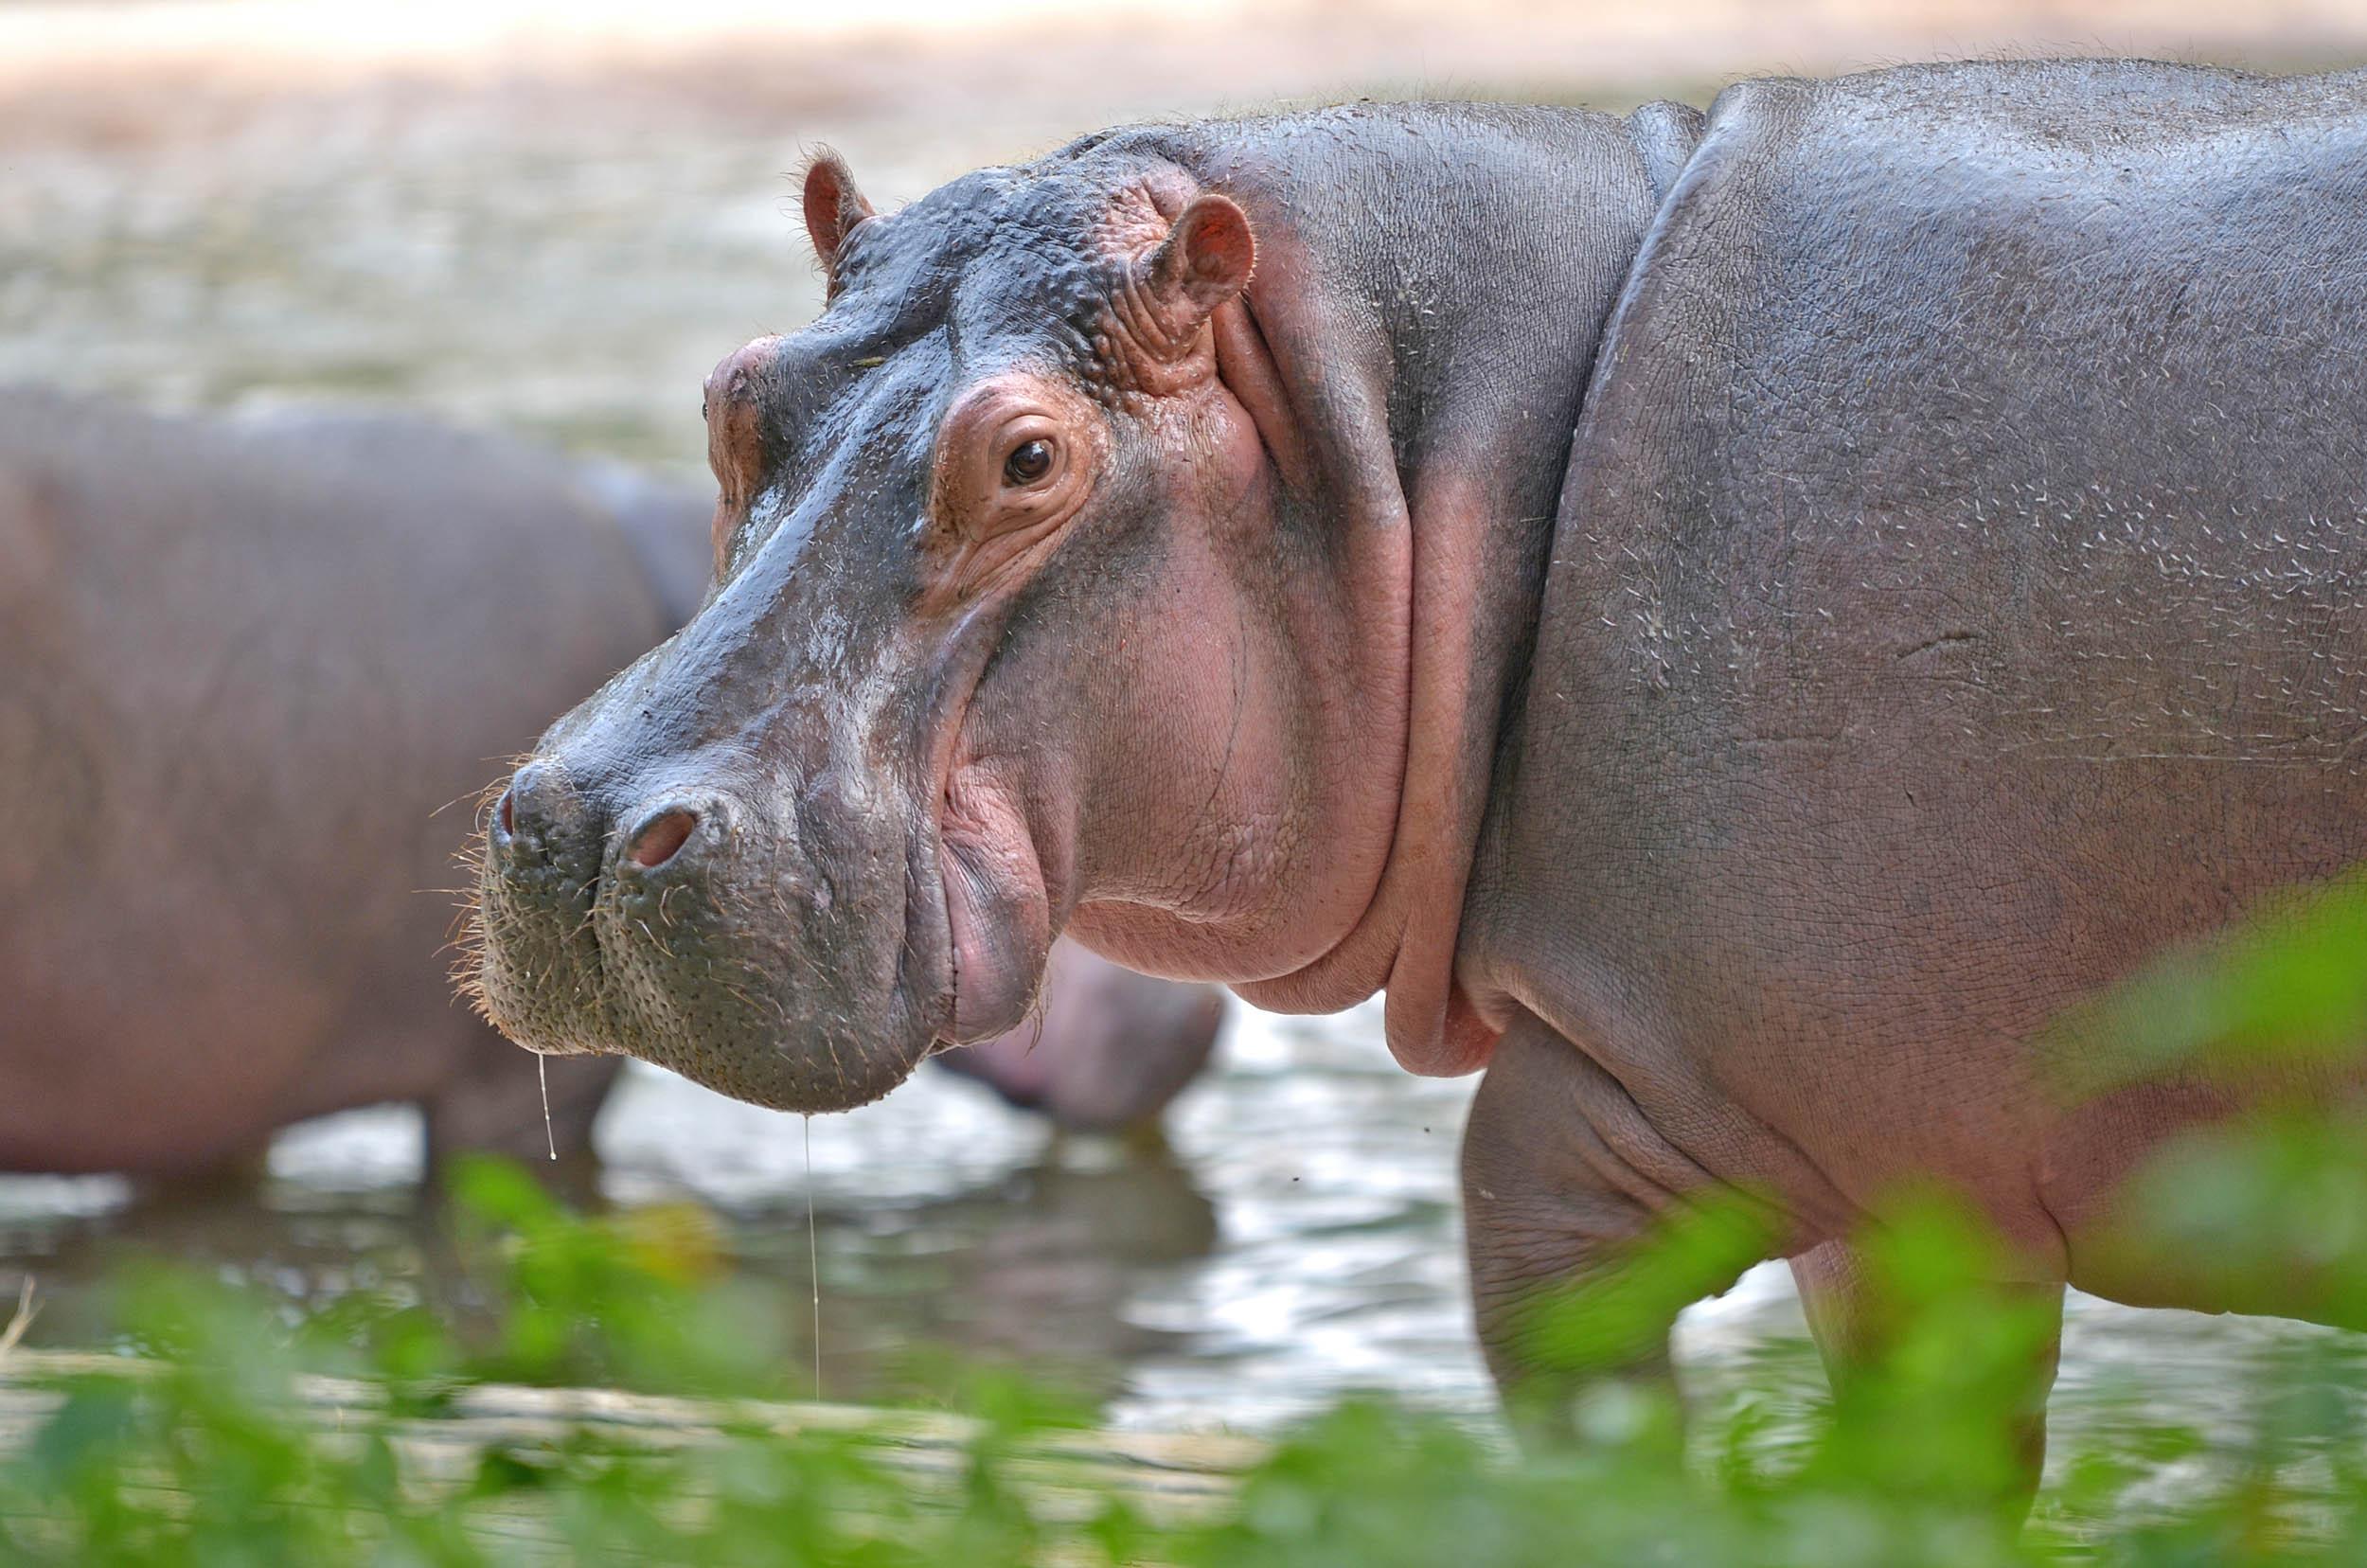 Vagina like a yawning hippo by tomvinny